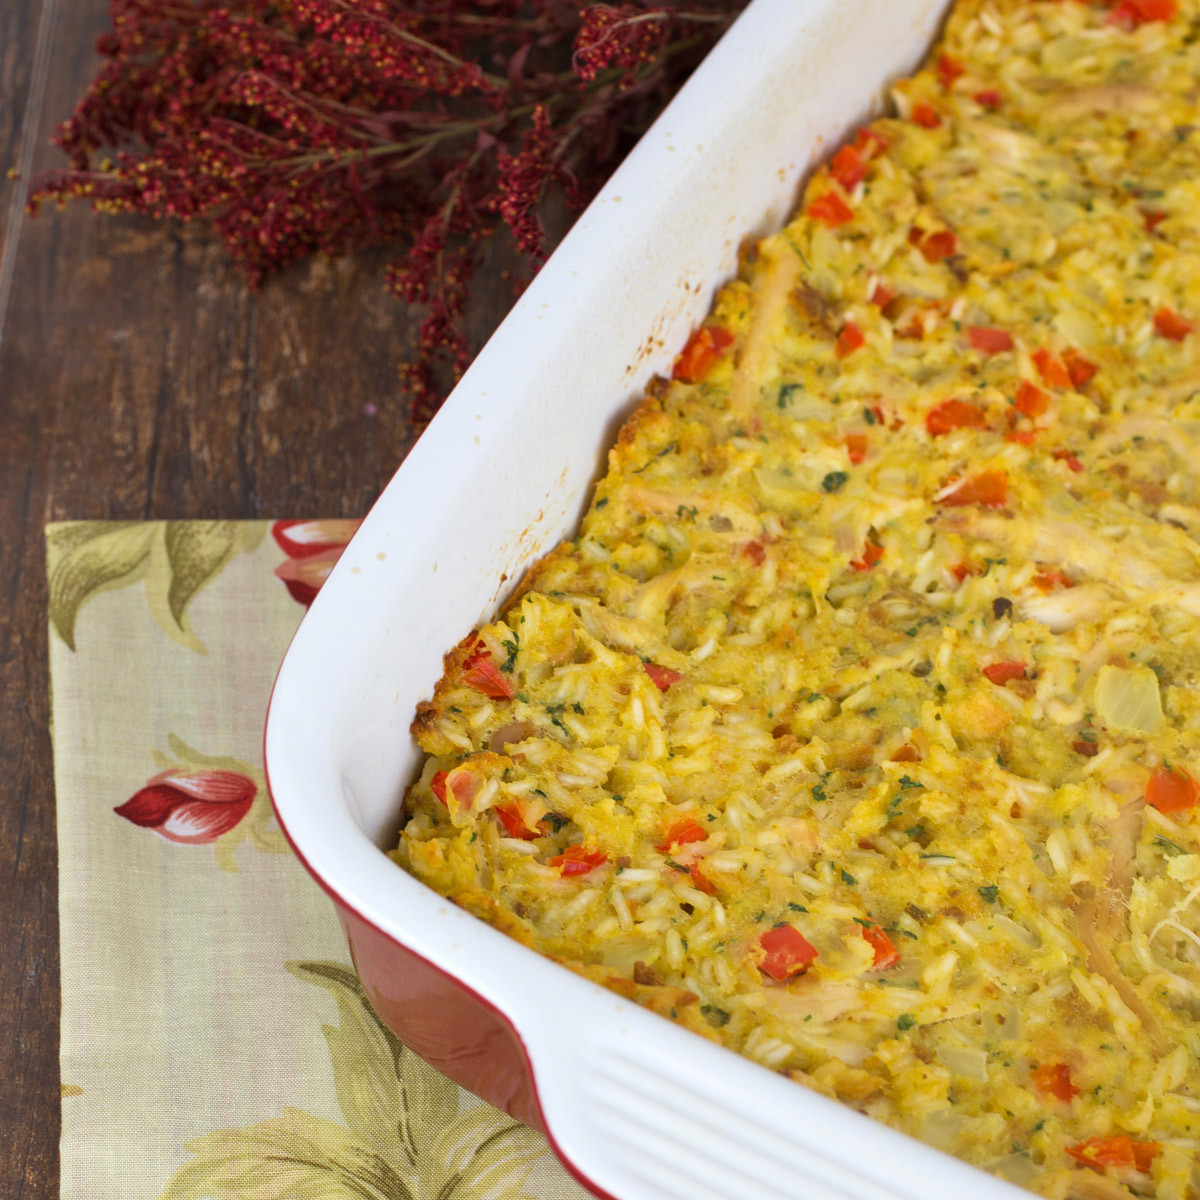 Chicken And Stuffing Casserole  Chicken and Stuffing Casserole